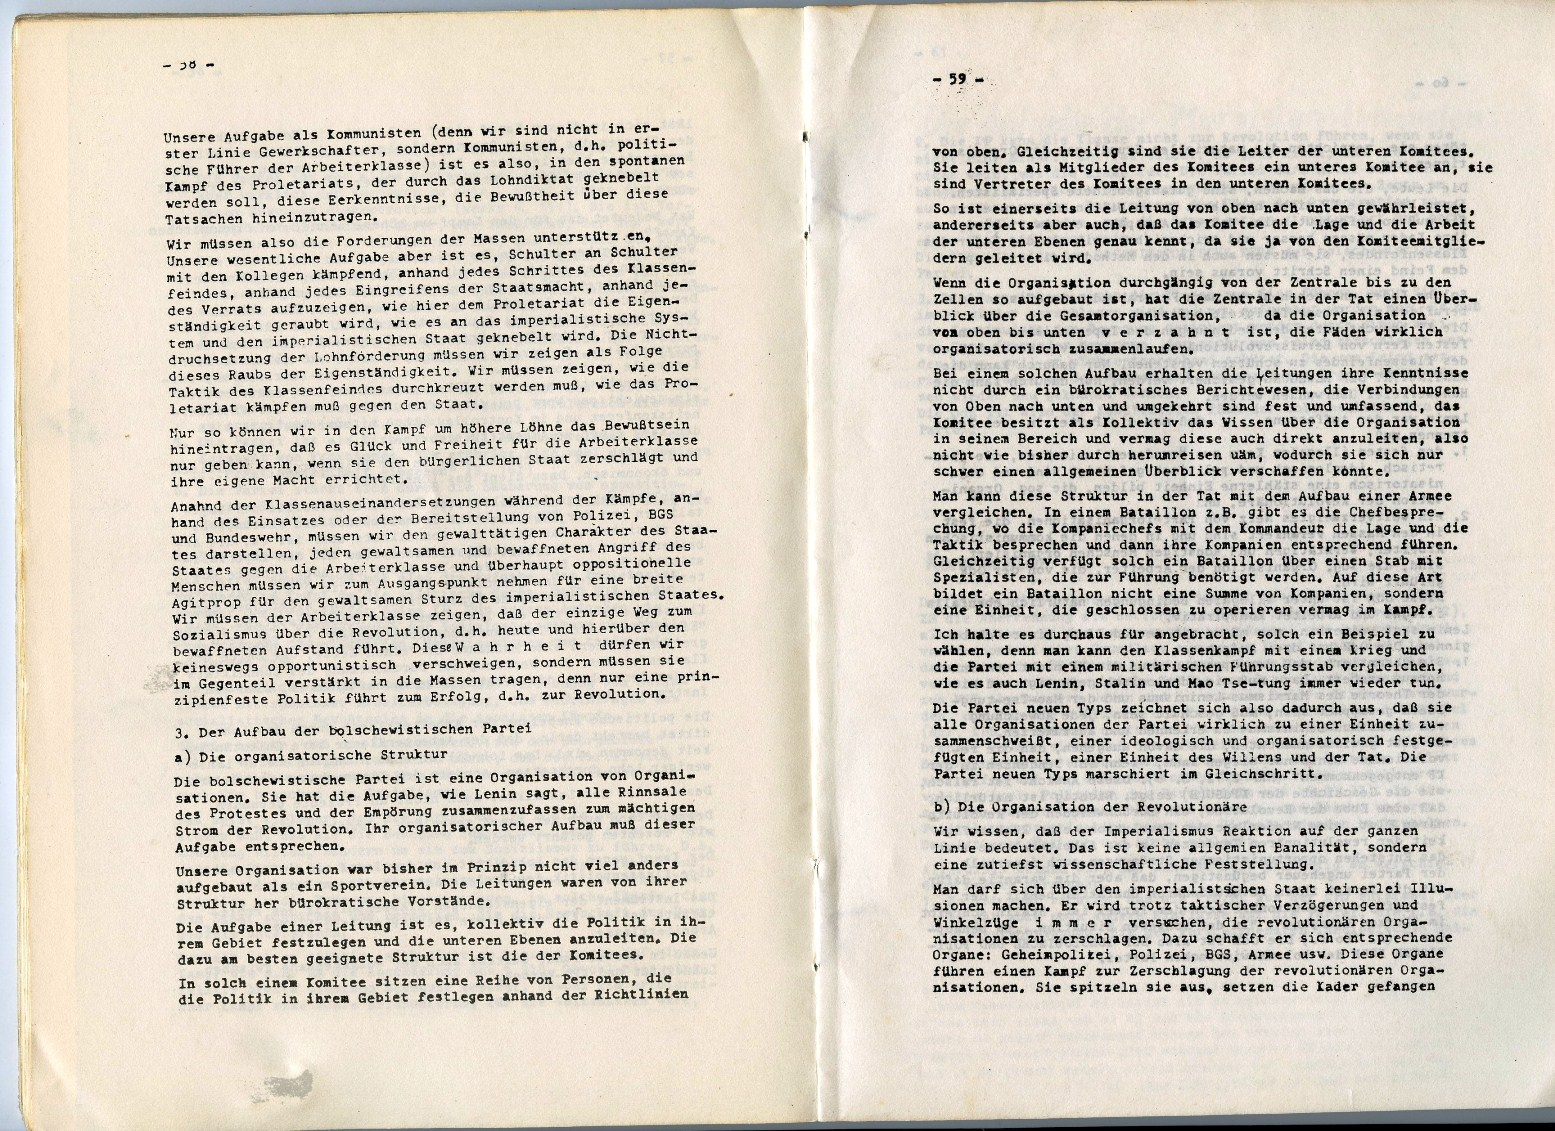 ZB_Universitas_1972_33